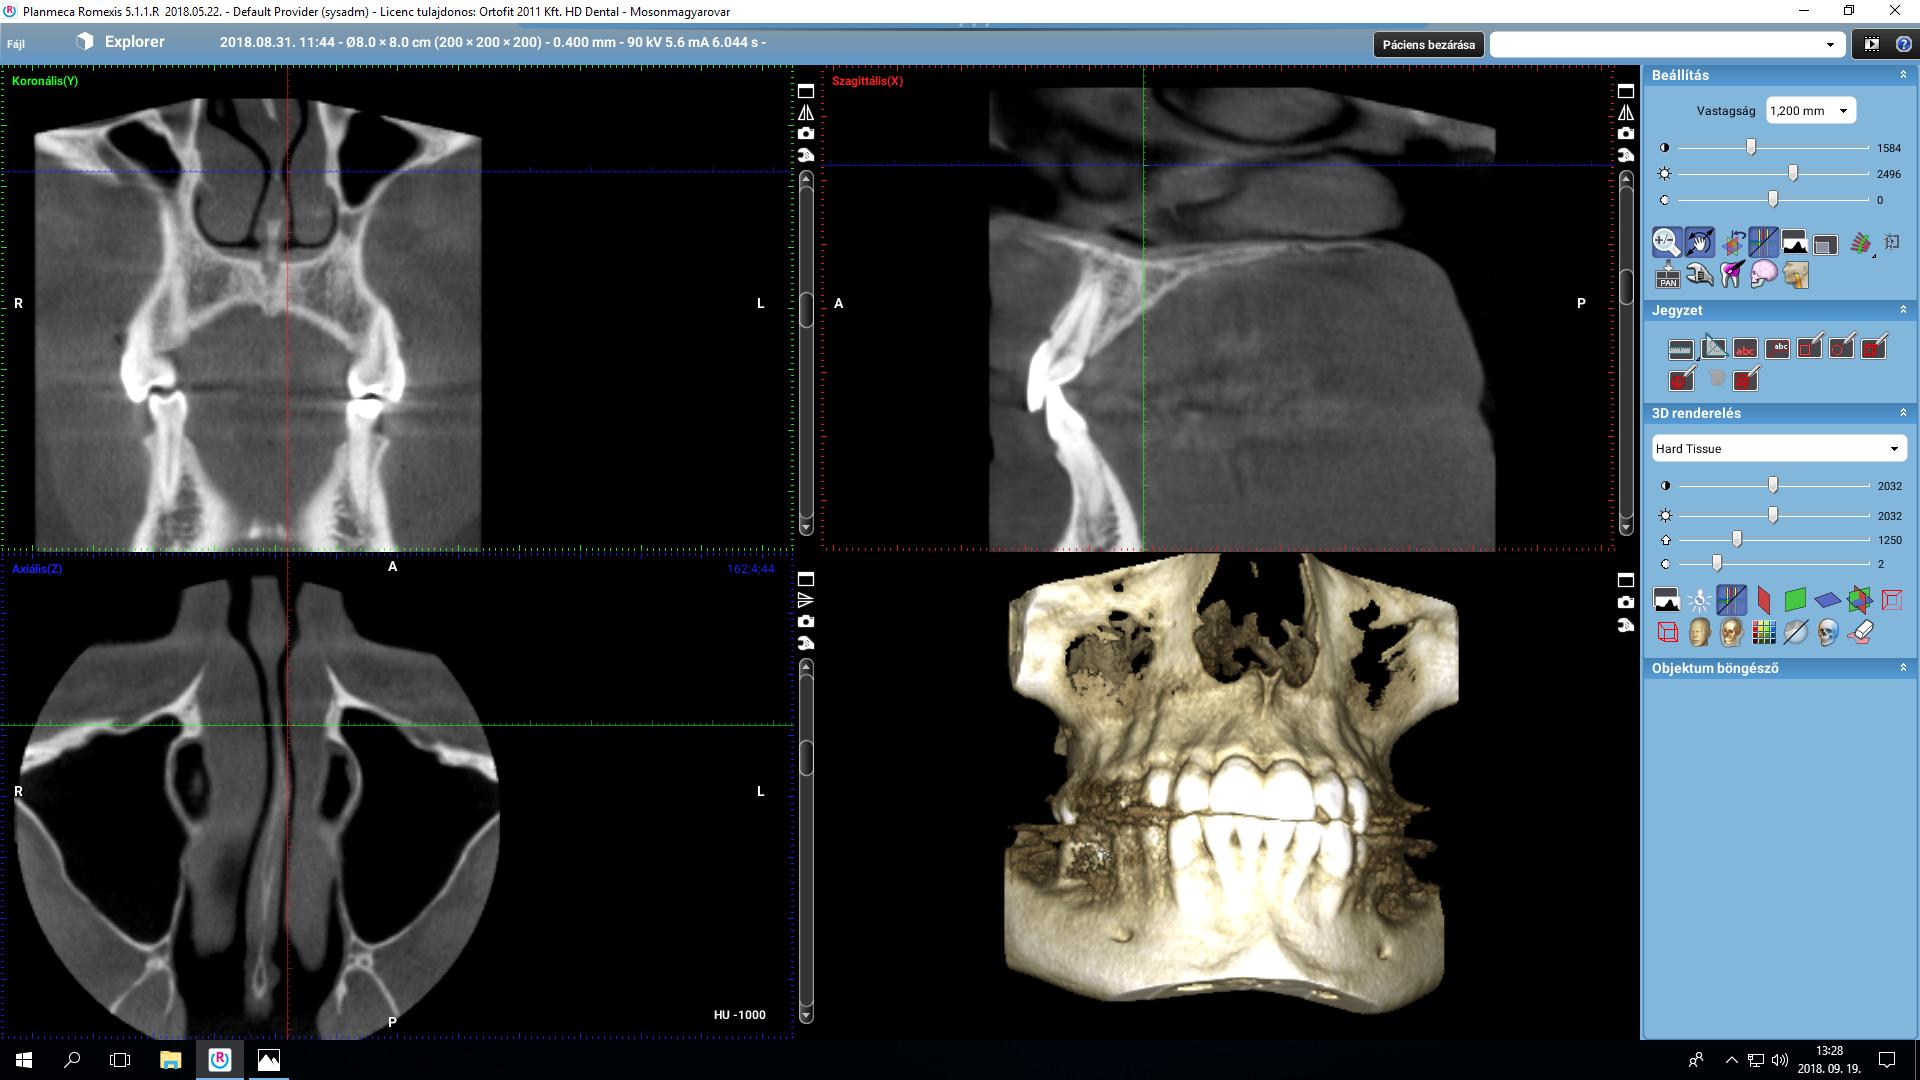 3d-zahnröntgen-planmeca-aufnahme